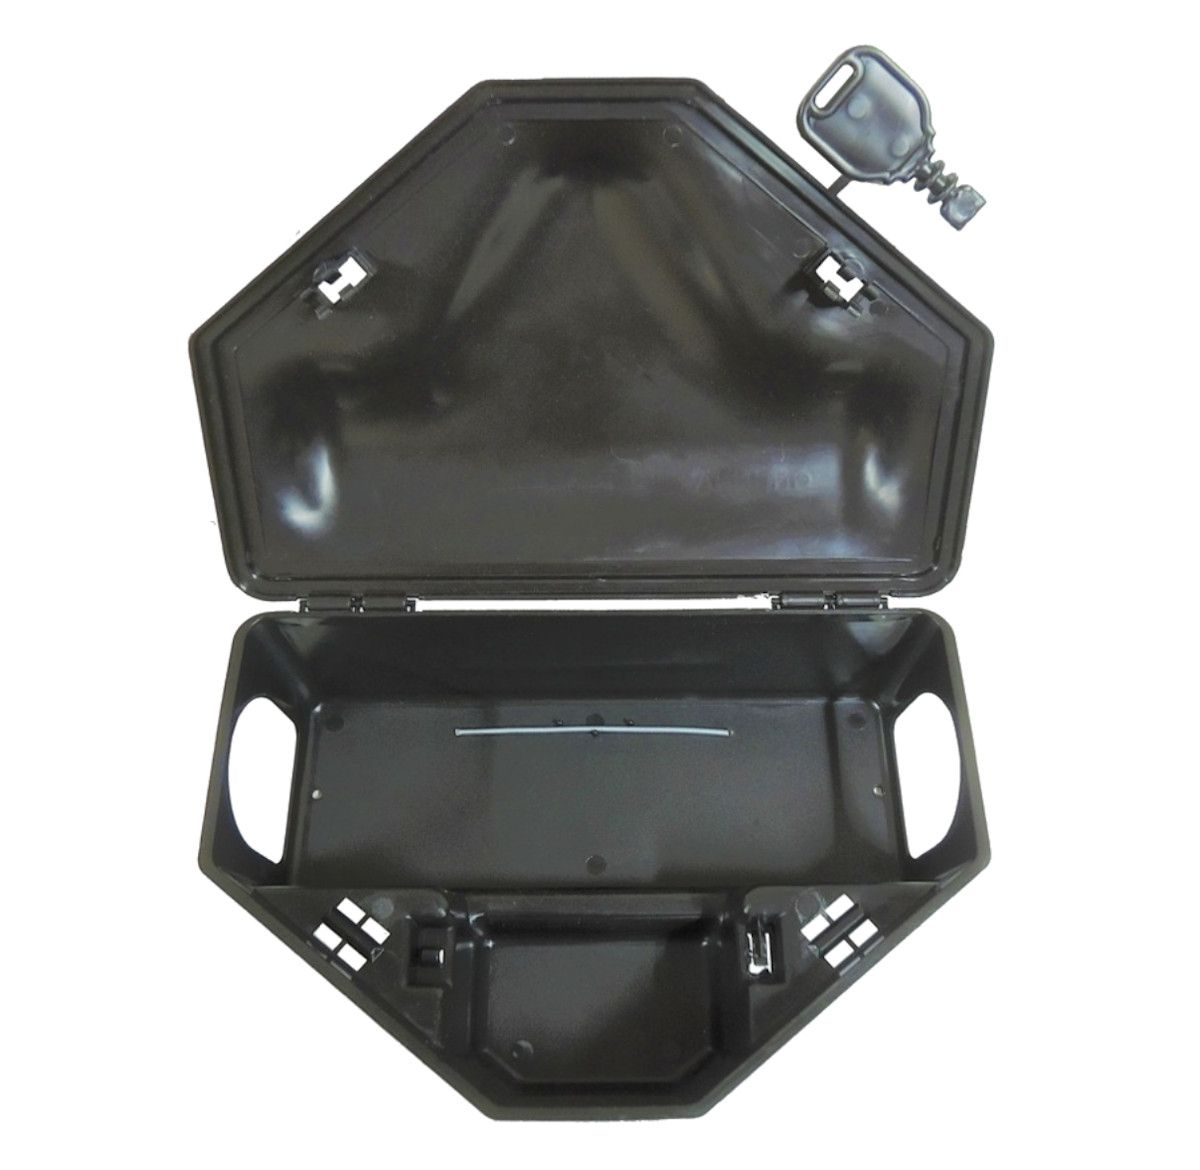 KIT 45 Porta Iscas Resistentes 2 TRAVAS c/ Chave Mata Ratos